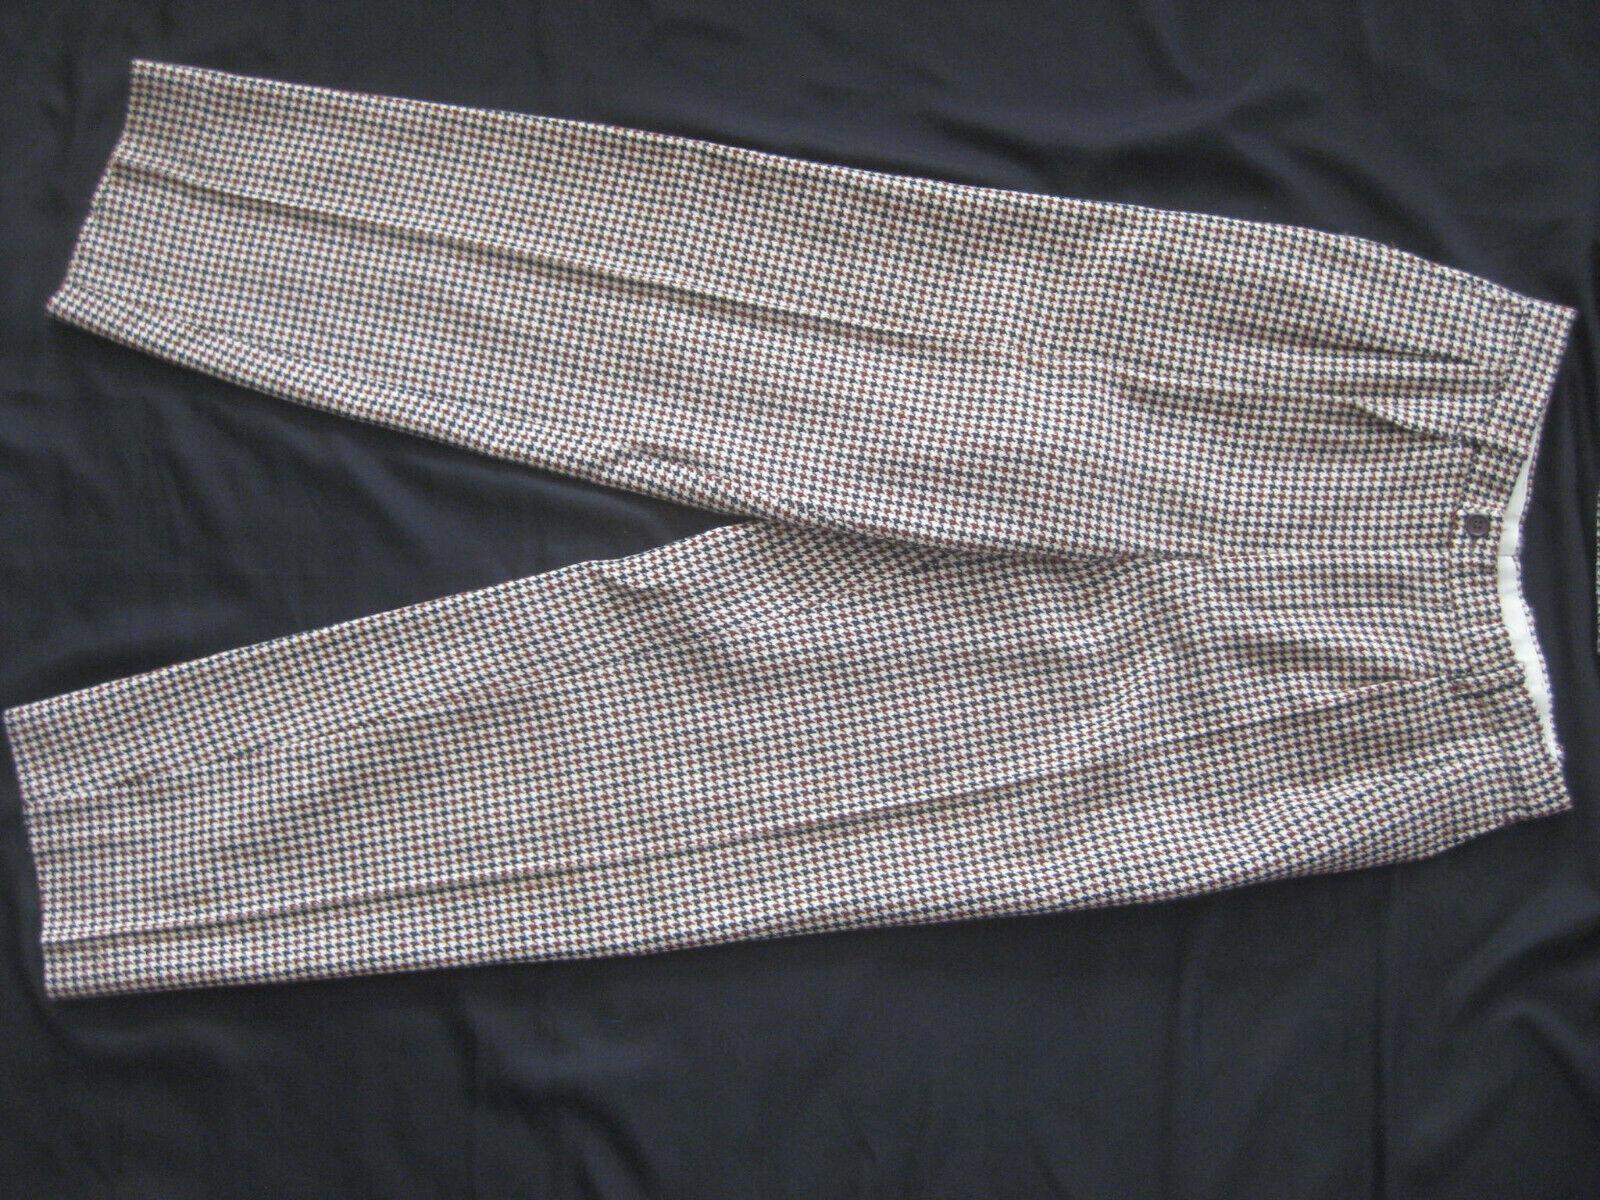 1980s KENZO Paris Wool HOUNDSTOOTH PLAID Pleat Fr… - image 4